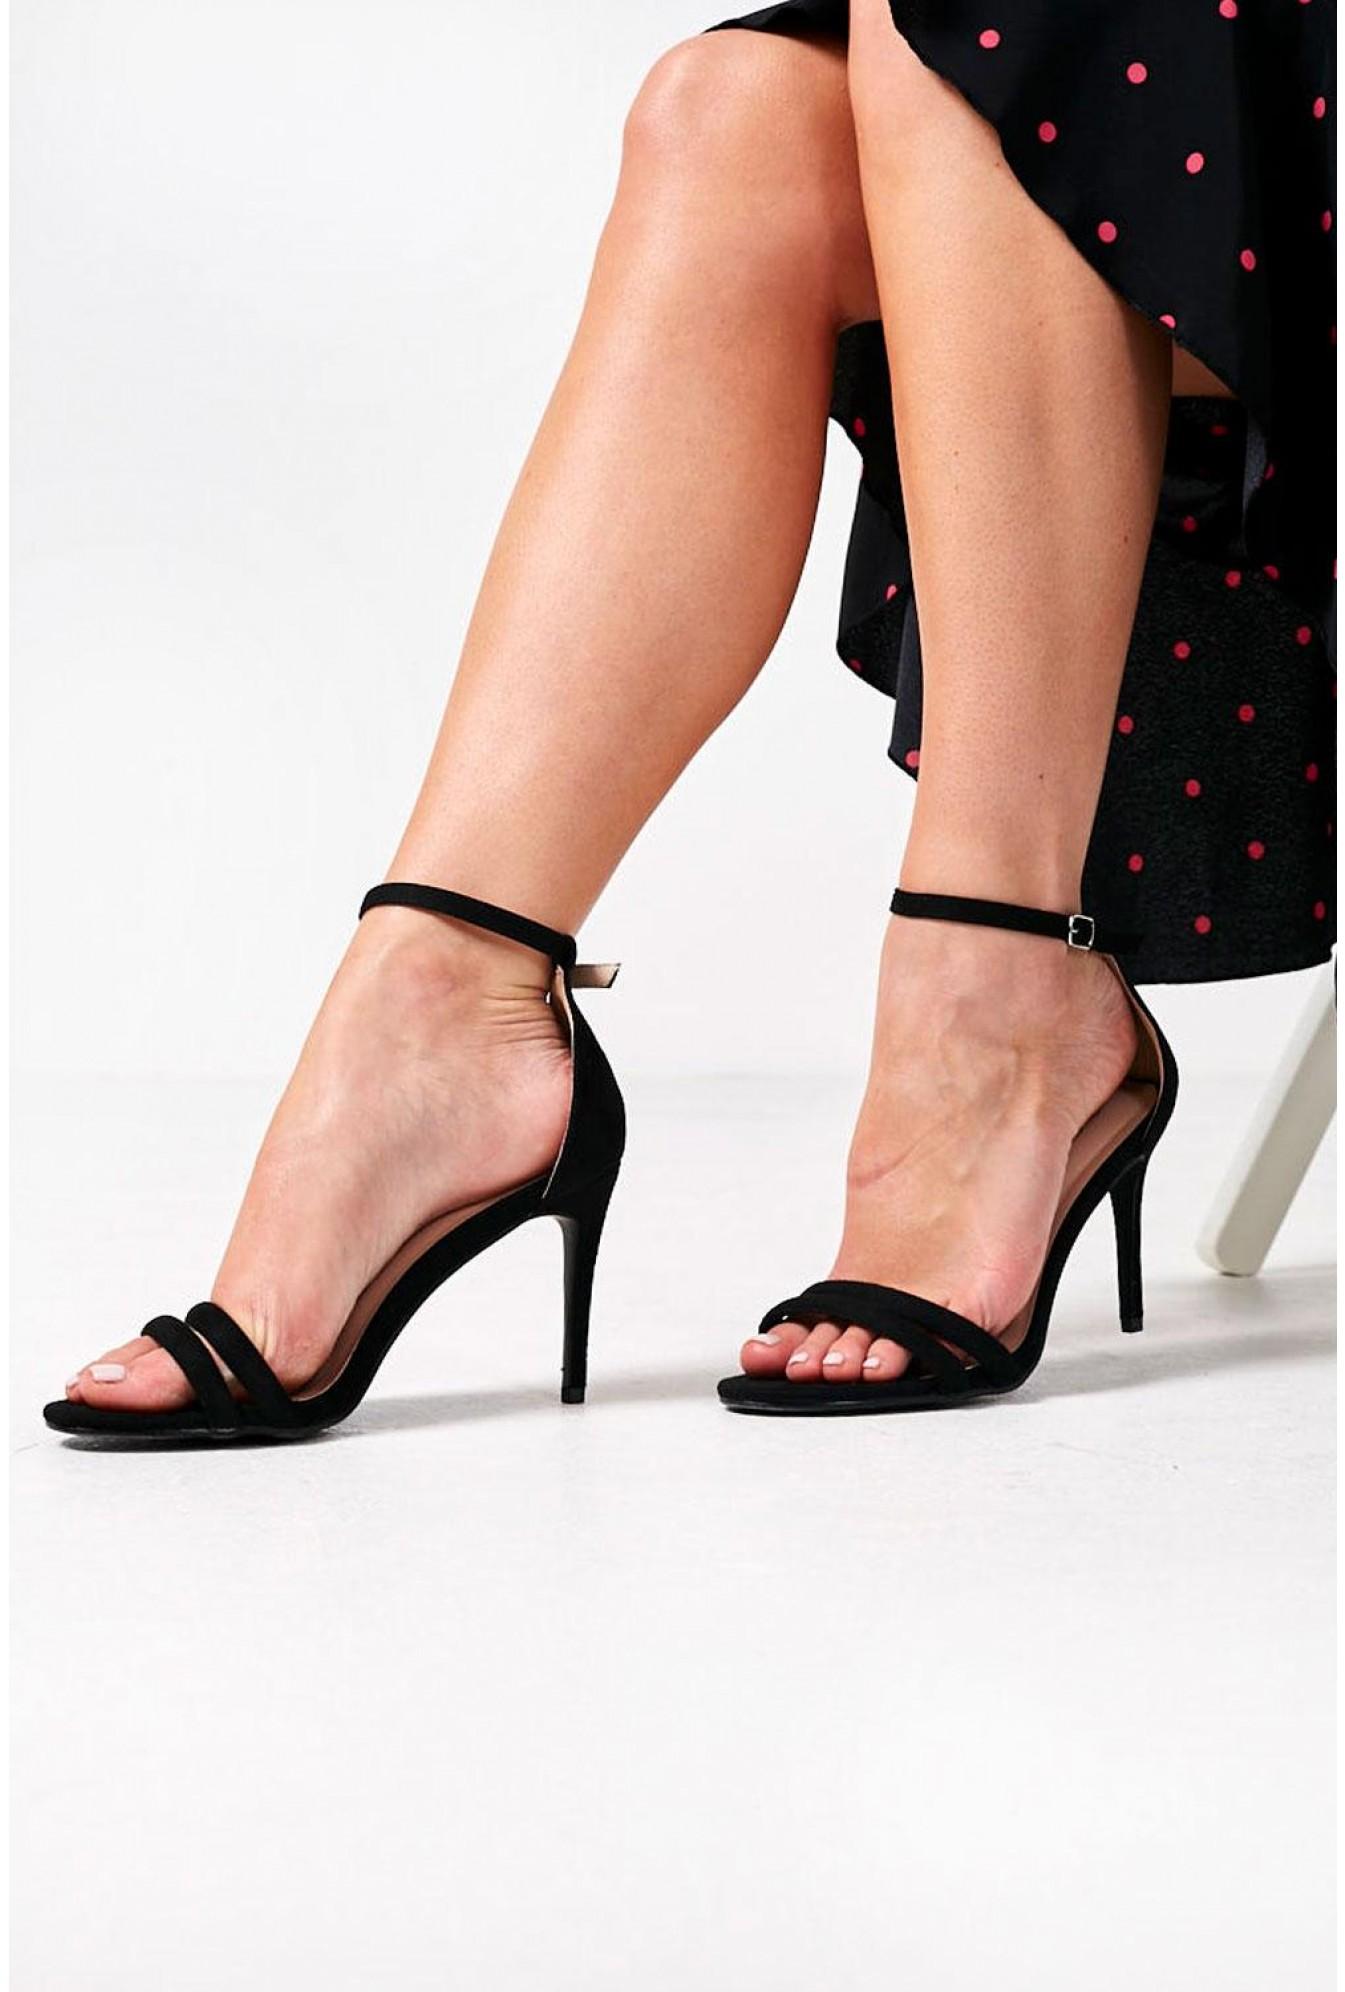 83f8ac00613 Isabella Ankle Strap Heels in Black Suede